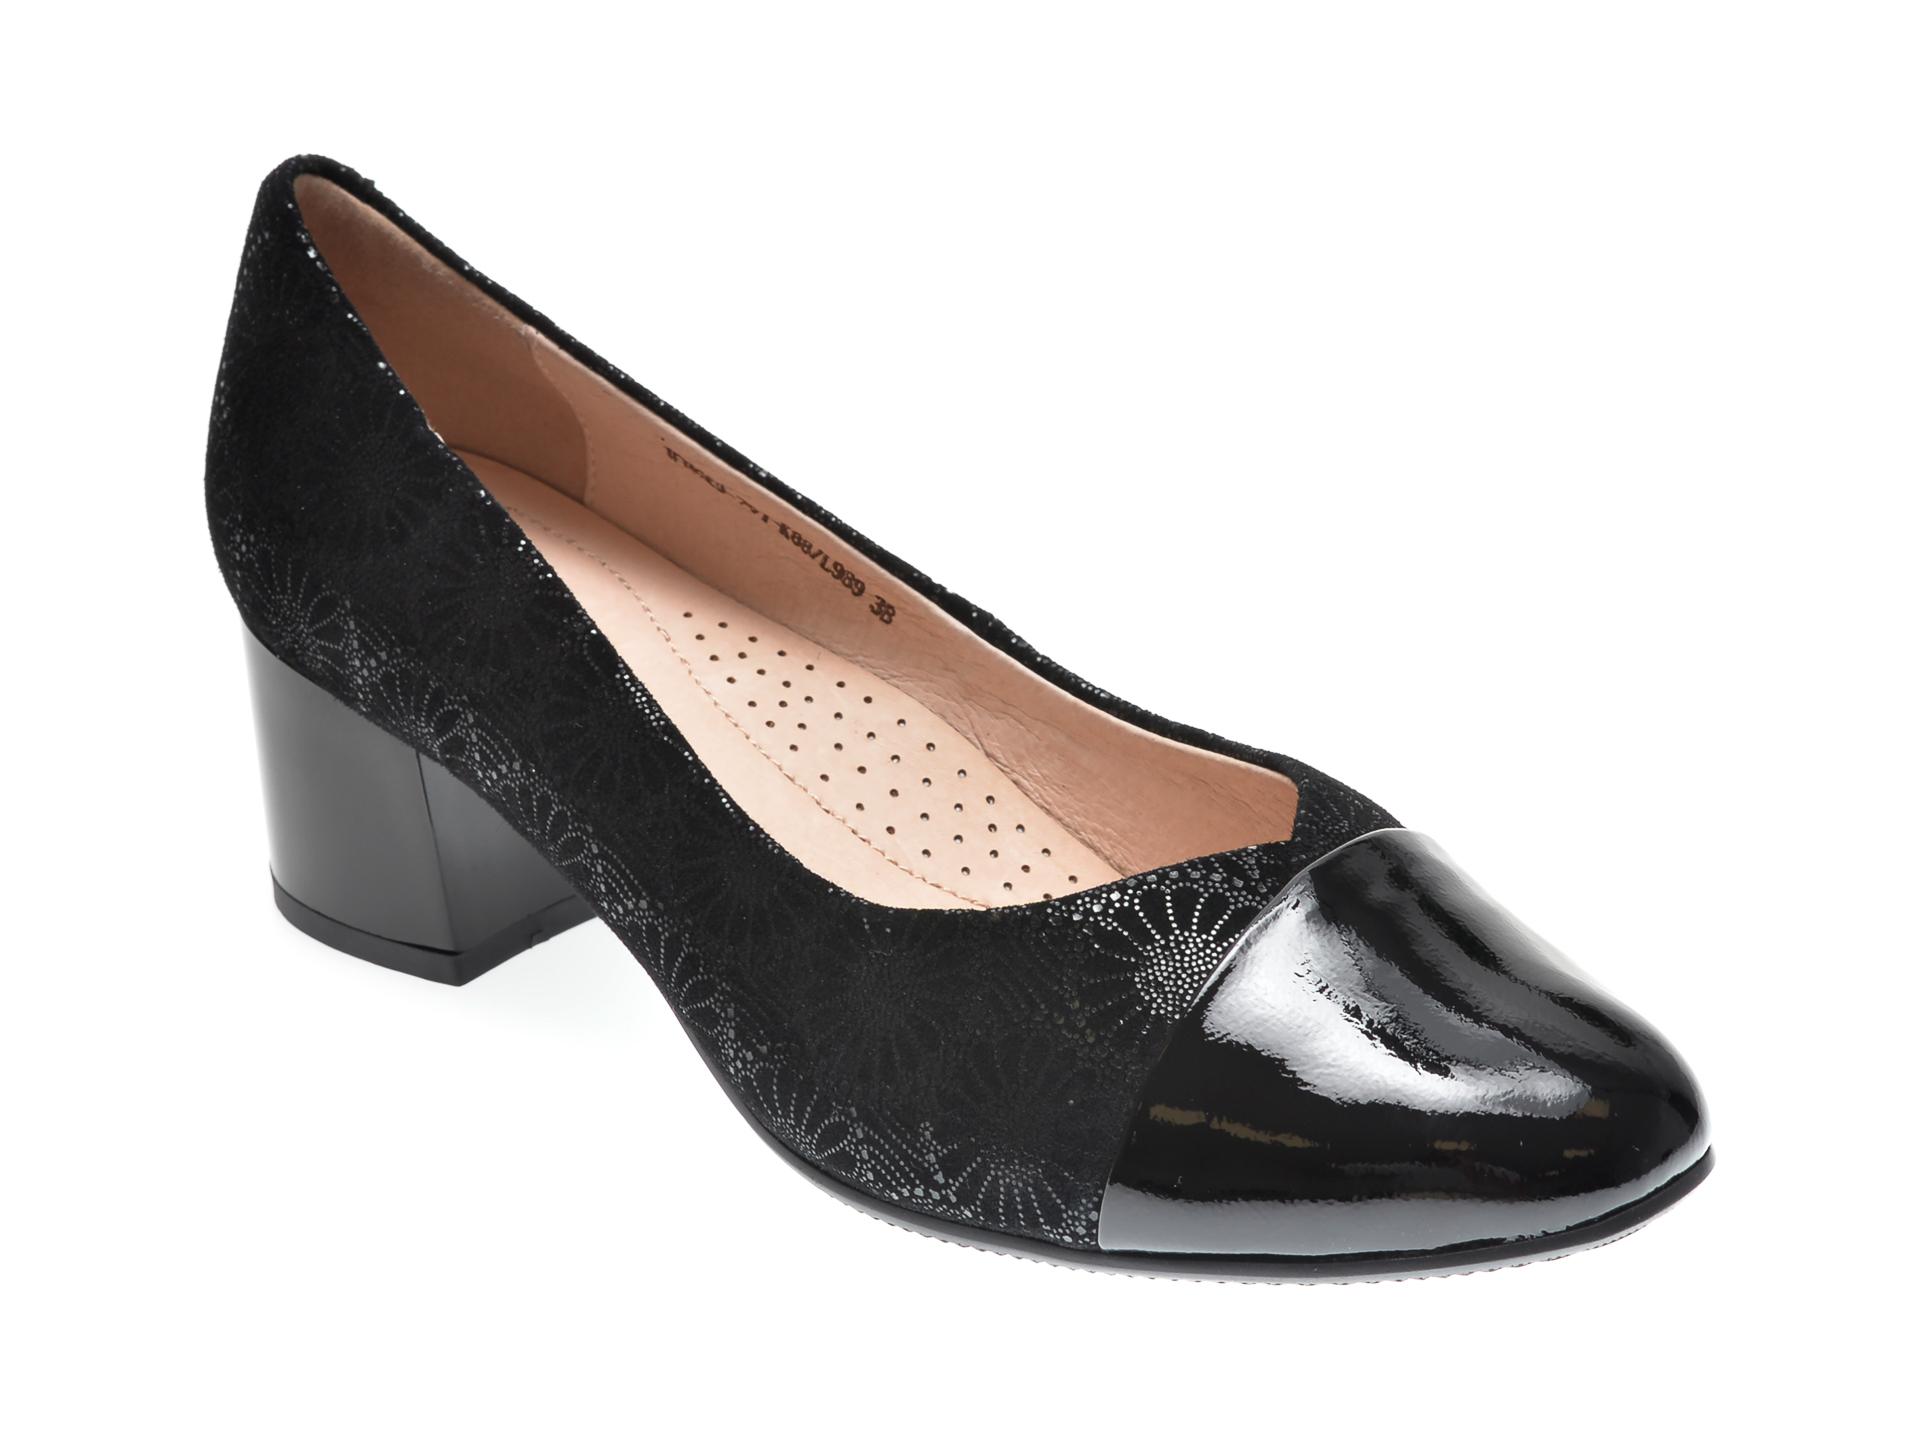 Pantofi KARISMA negri, 1FH6701, din piele intoarsa New